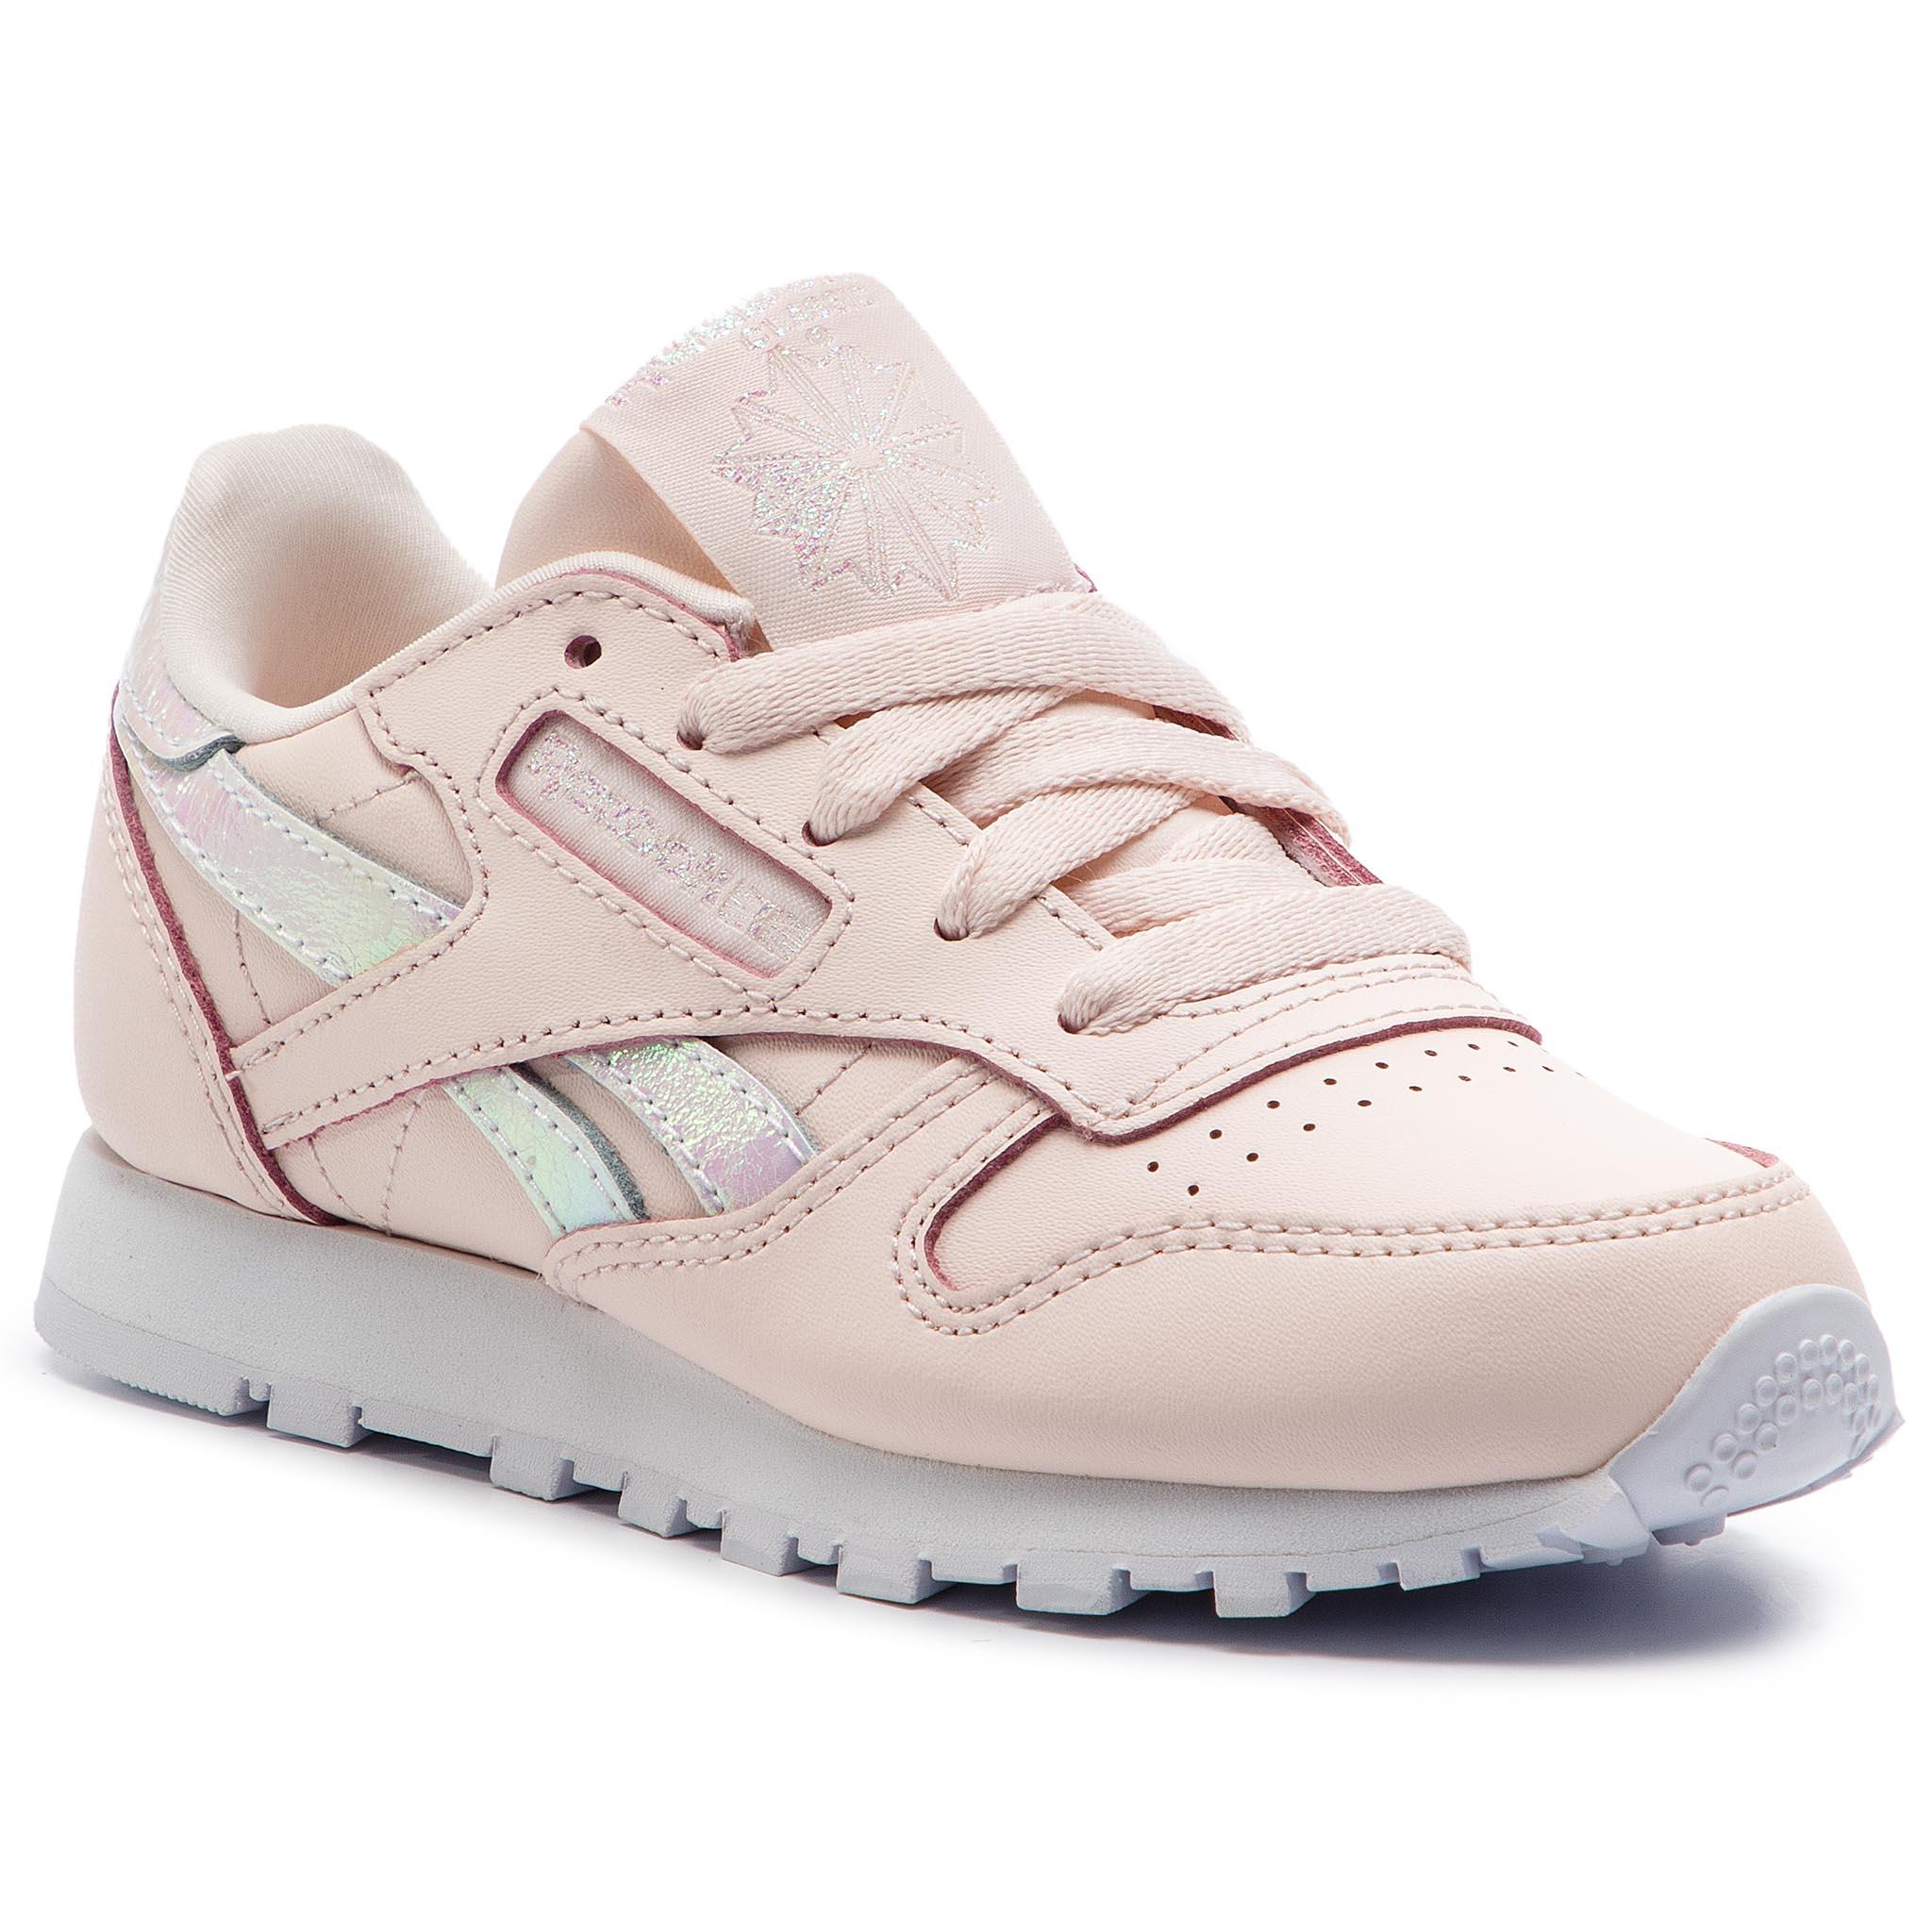 Shoes Reebok Cl Nylon DV4410 Practical PinkWhiteSilv